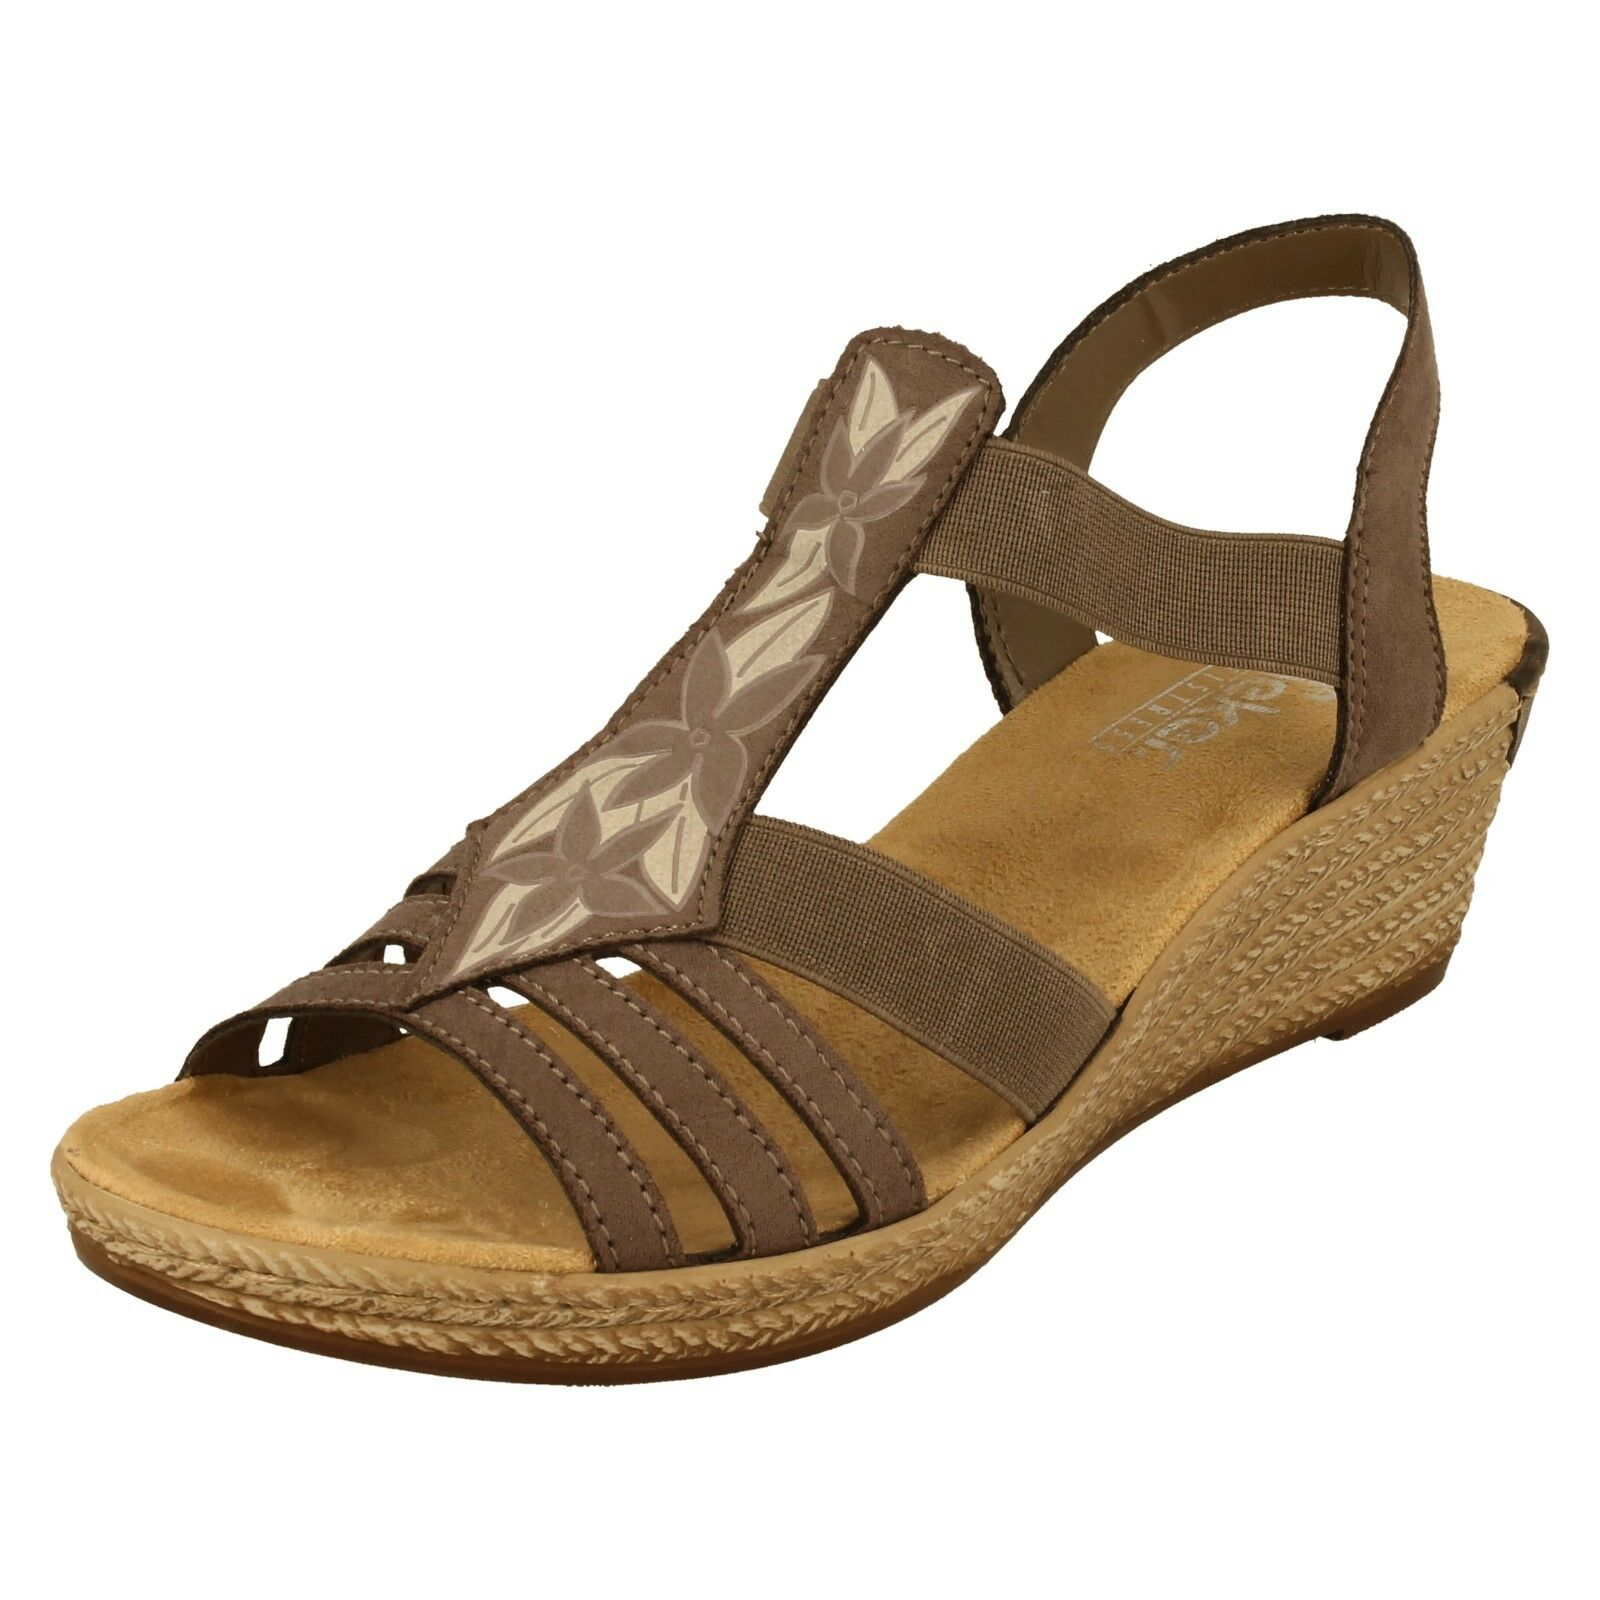 Damenschuhe Rieker Sandale - 62411